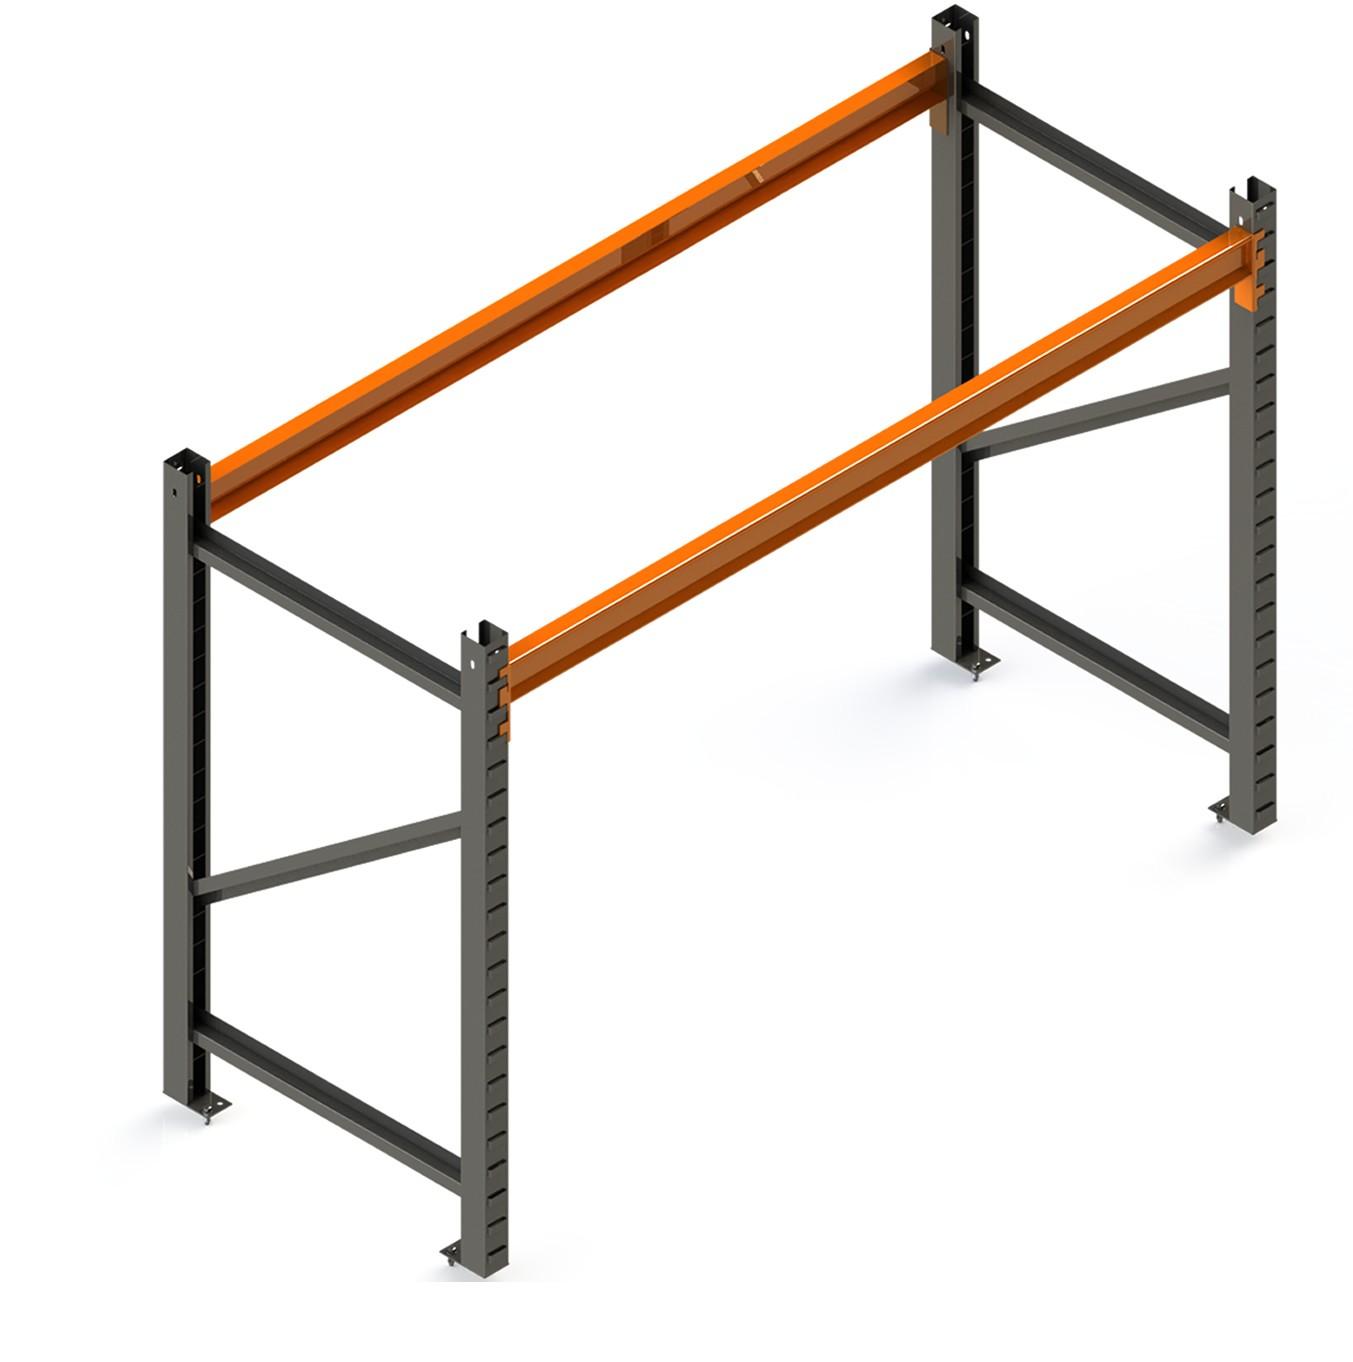 Porta Paletes Inicial 2.00x2.30x1.00 - 1 Níveis 500 Kg